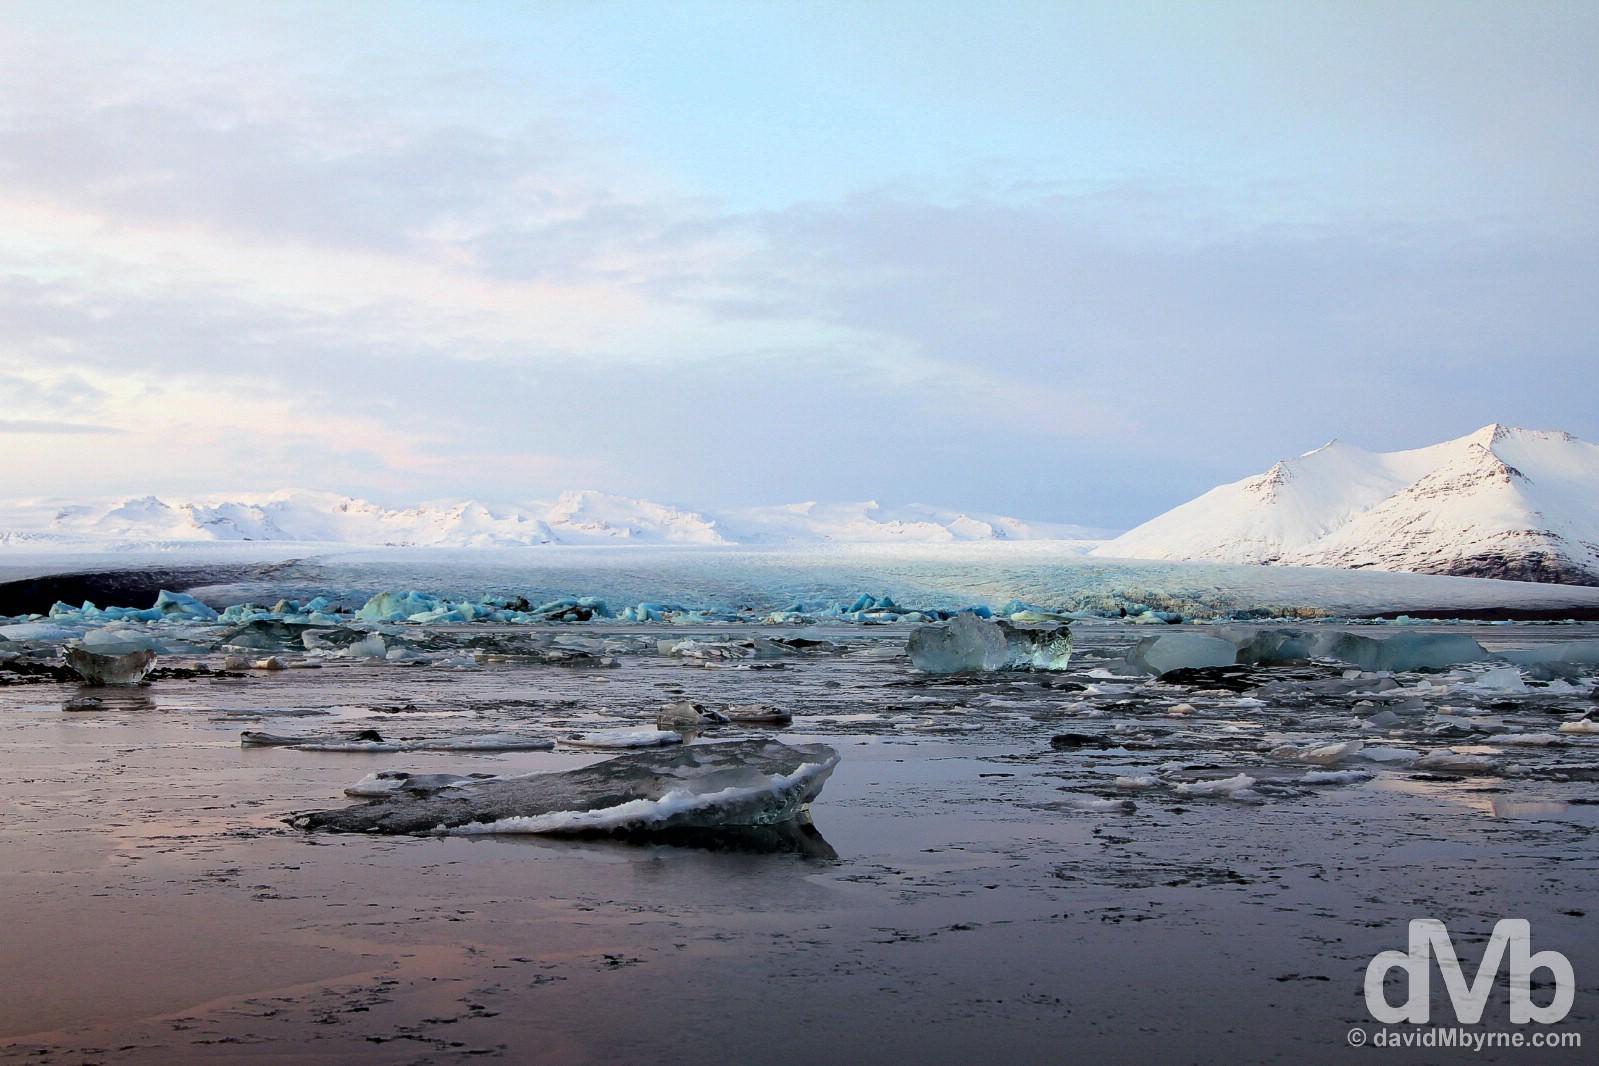 Jökulsárlón glacial lagoon, southern Iceland. December 4, 2012.